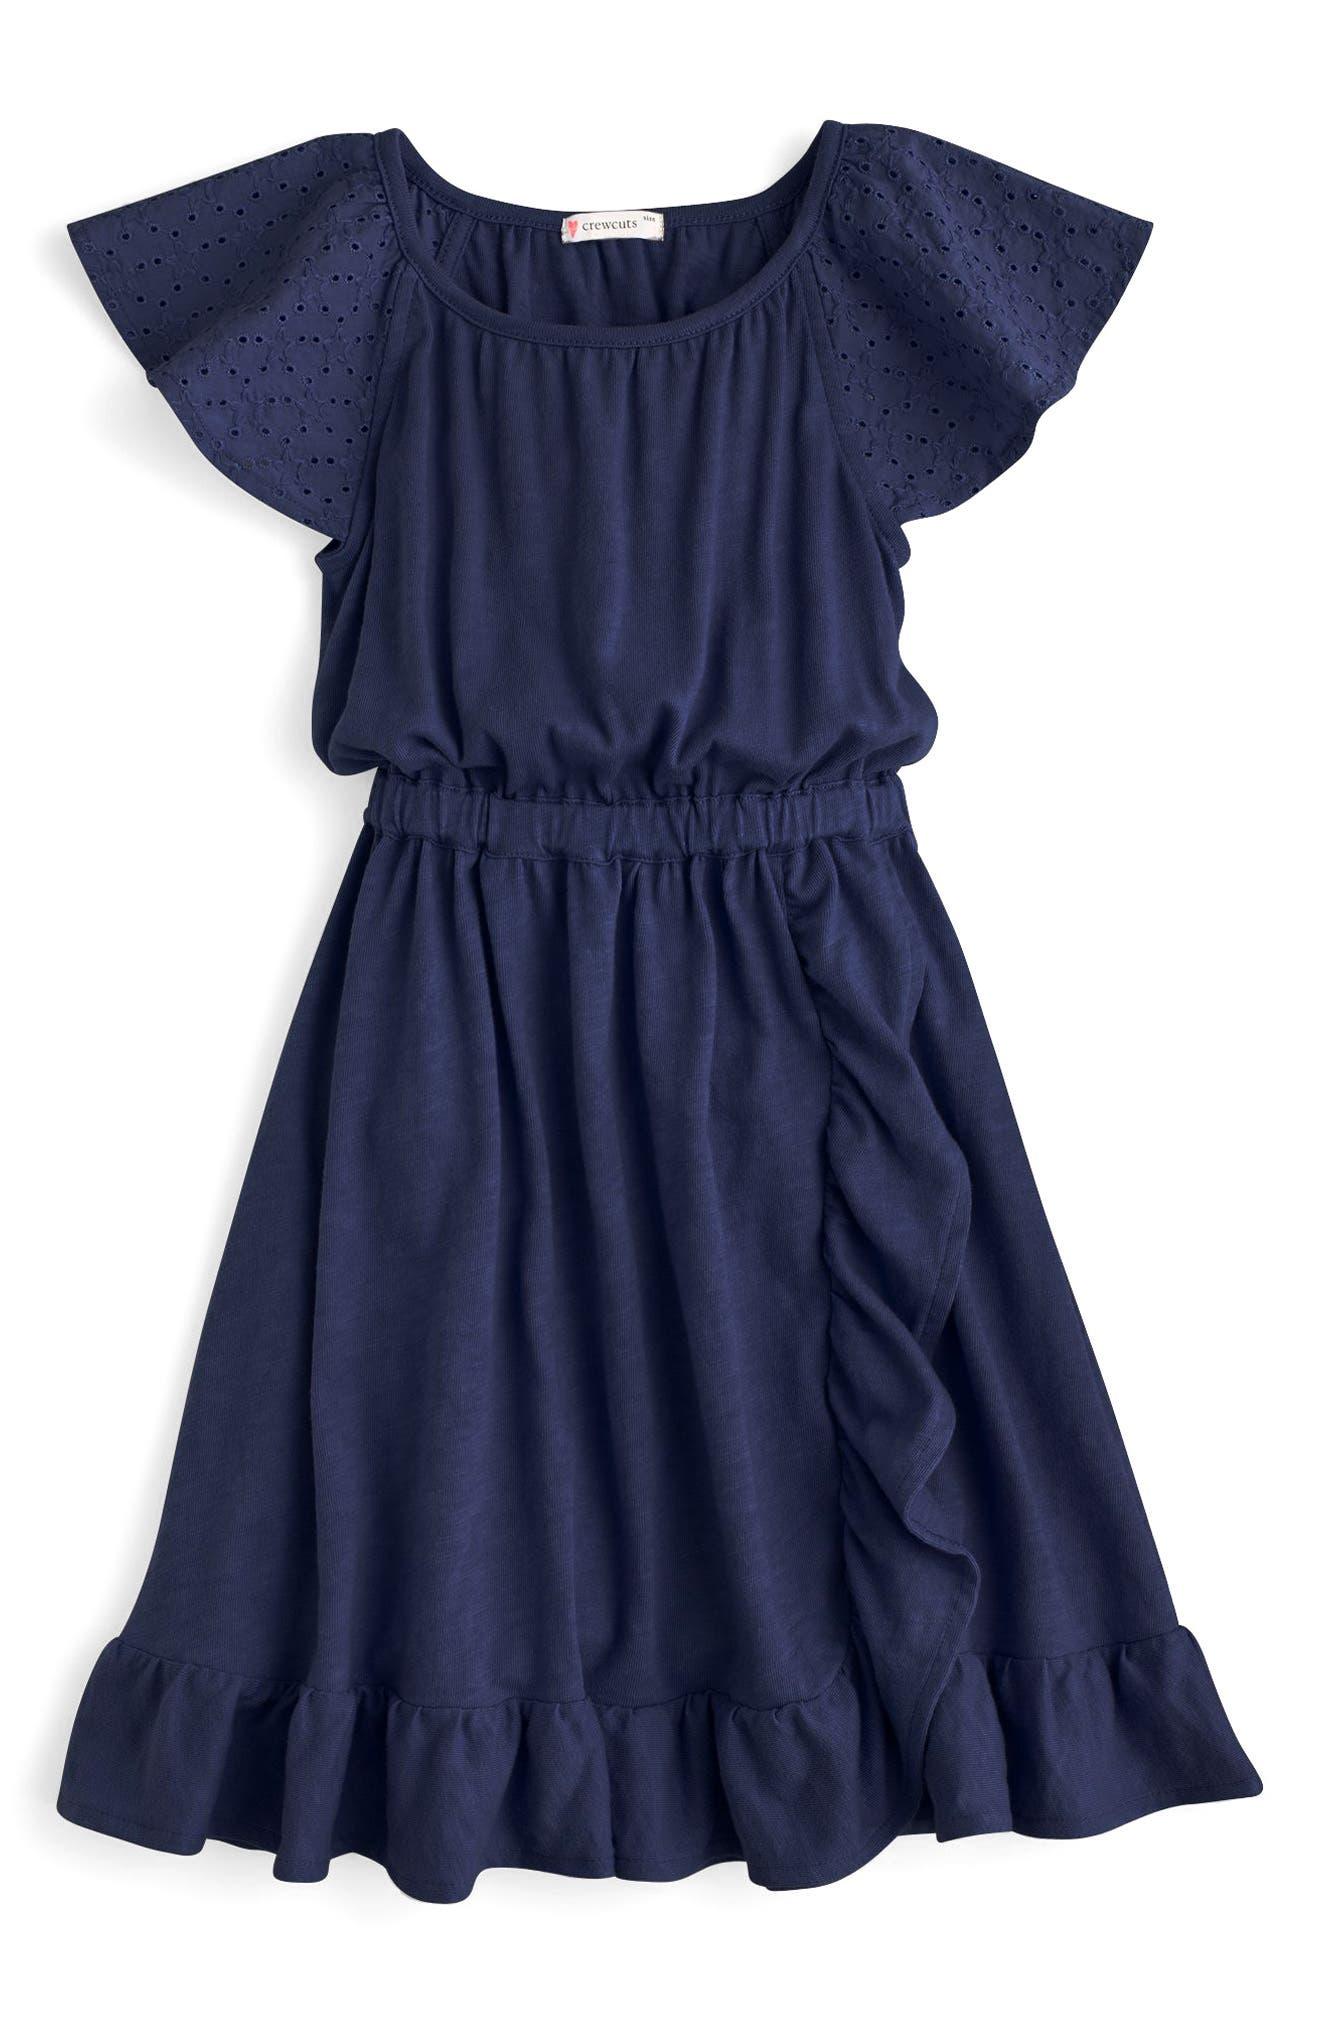 crewcuts by J. Crew Sorelle Eyelet Ruffle Dress (Toddler Girls, Little Girls & Big Girls)